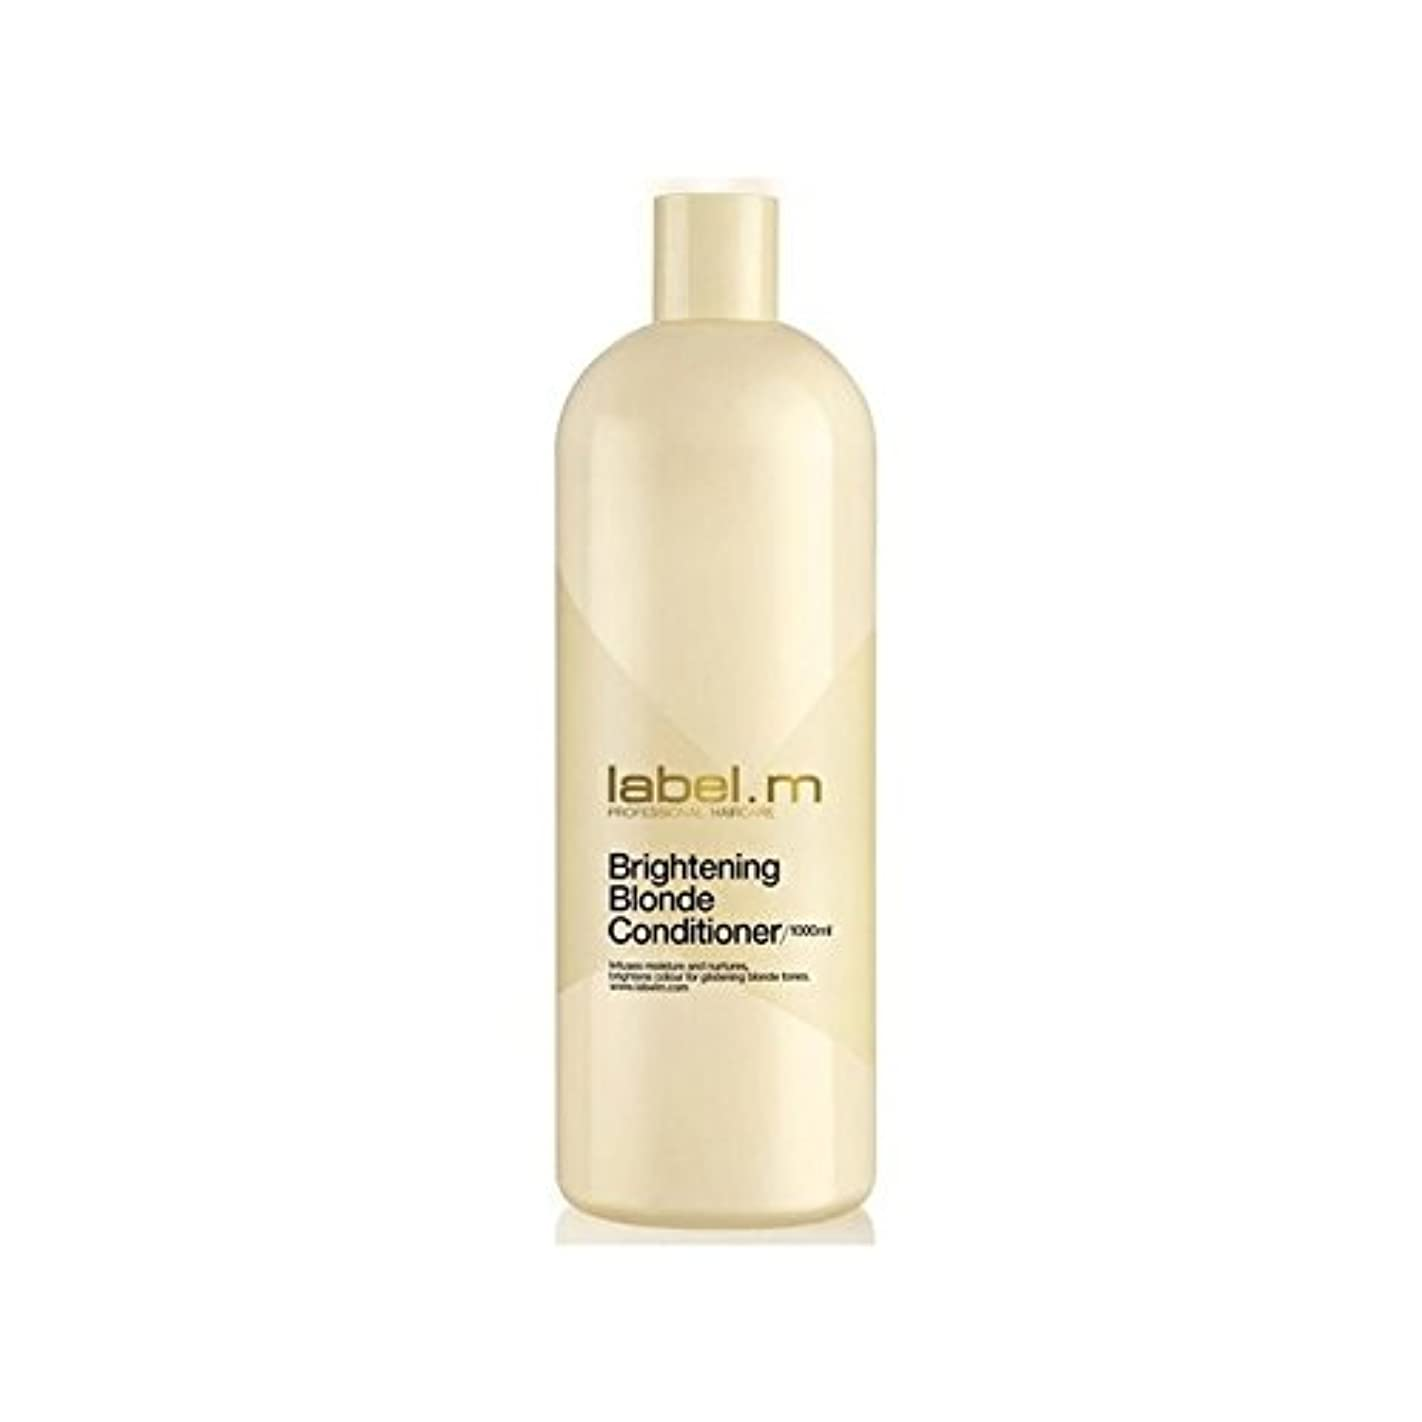 Label.M Brightening Blonde Conditioner (1000ml) - .白ブロンドコンディショナー(千ミリリットル) [並行輸入品]